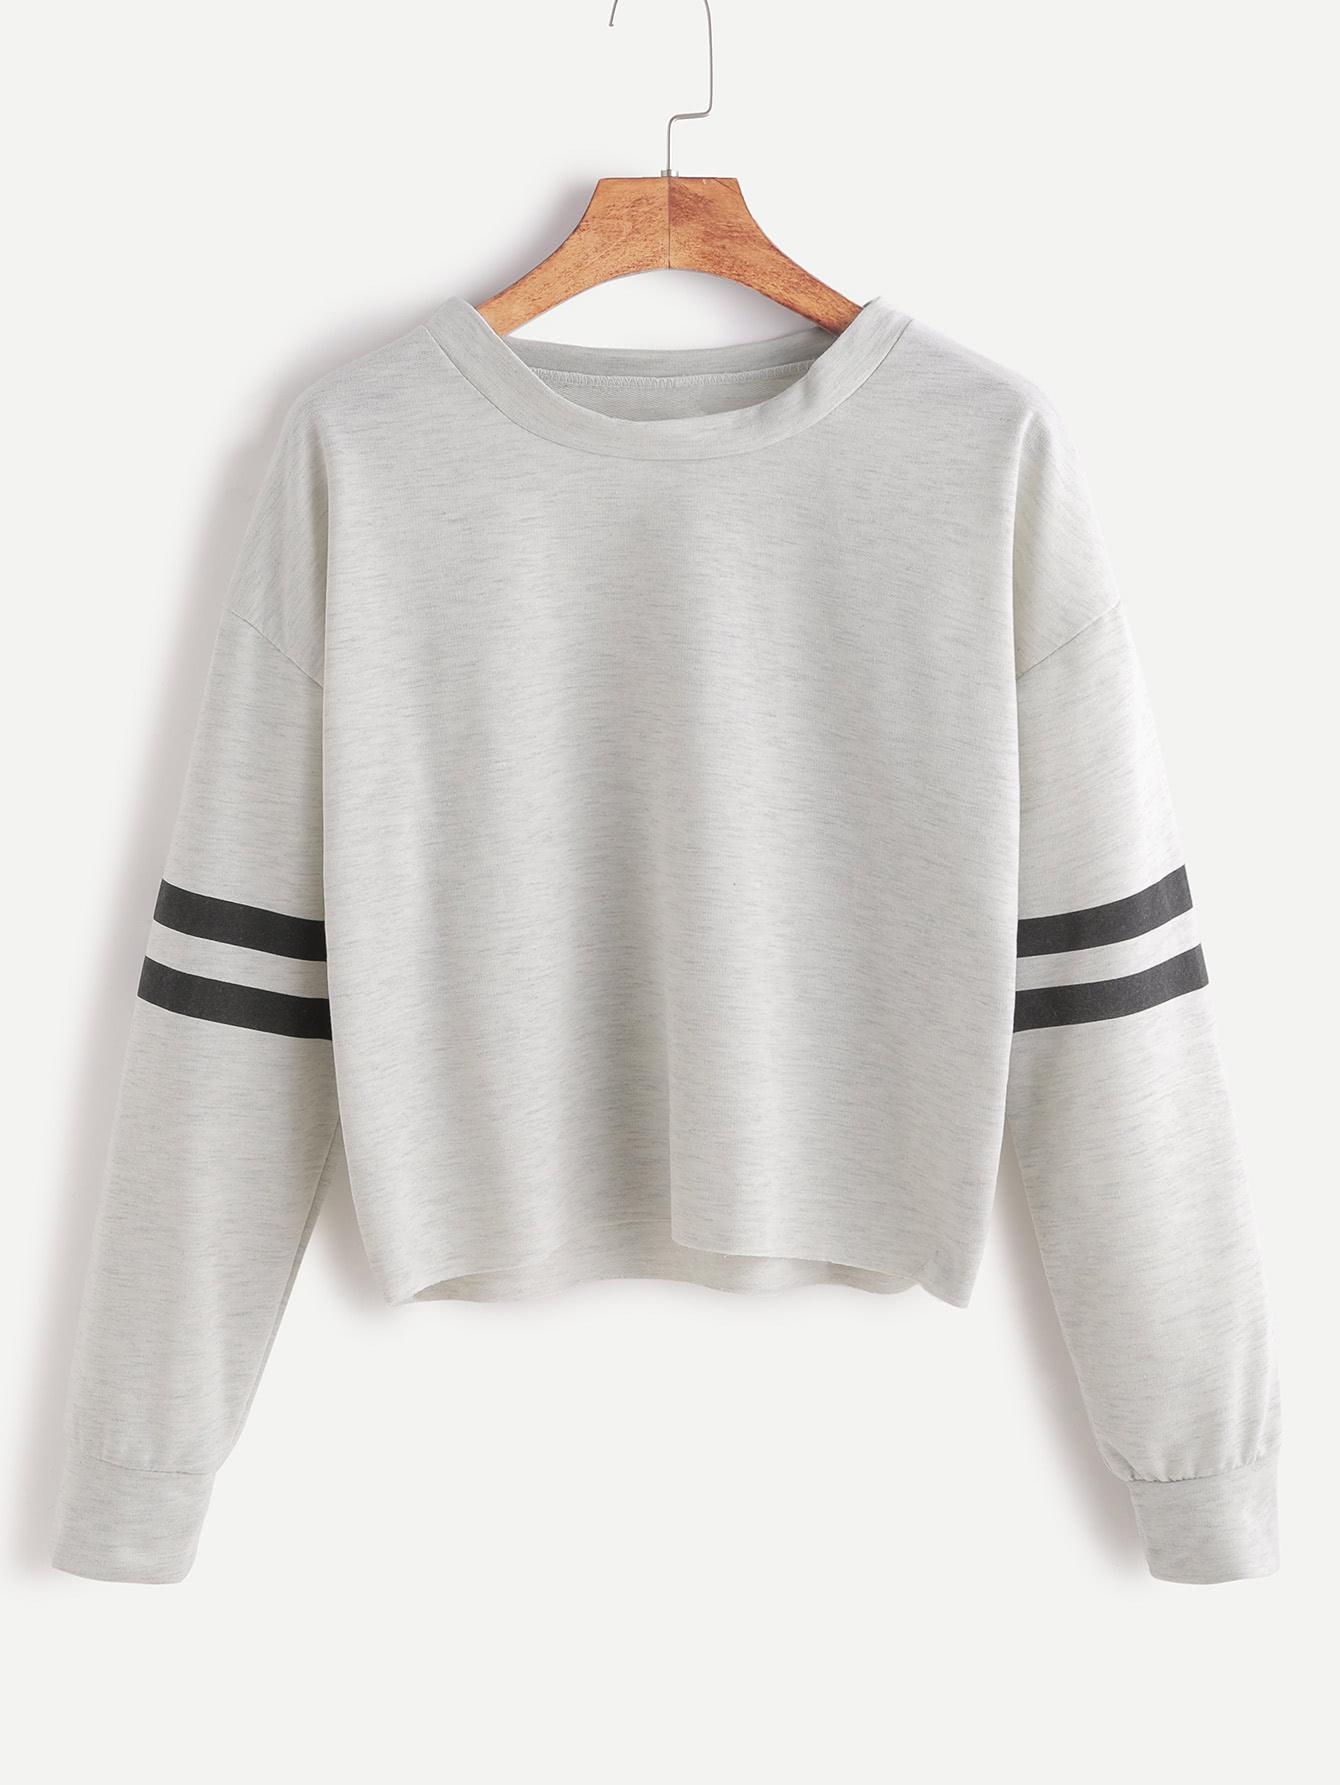 Heather Grey Drop Shoulder Varsity Striped Crop T-shirt drop shoulder water color crop sweatshirt